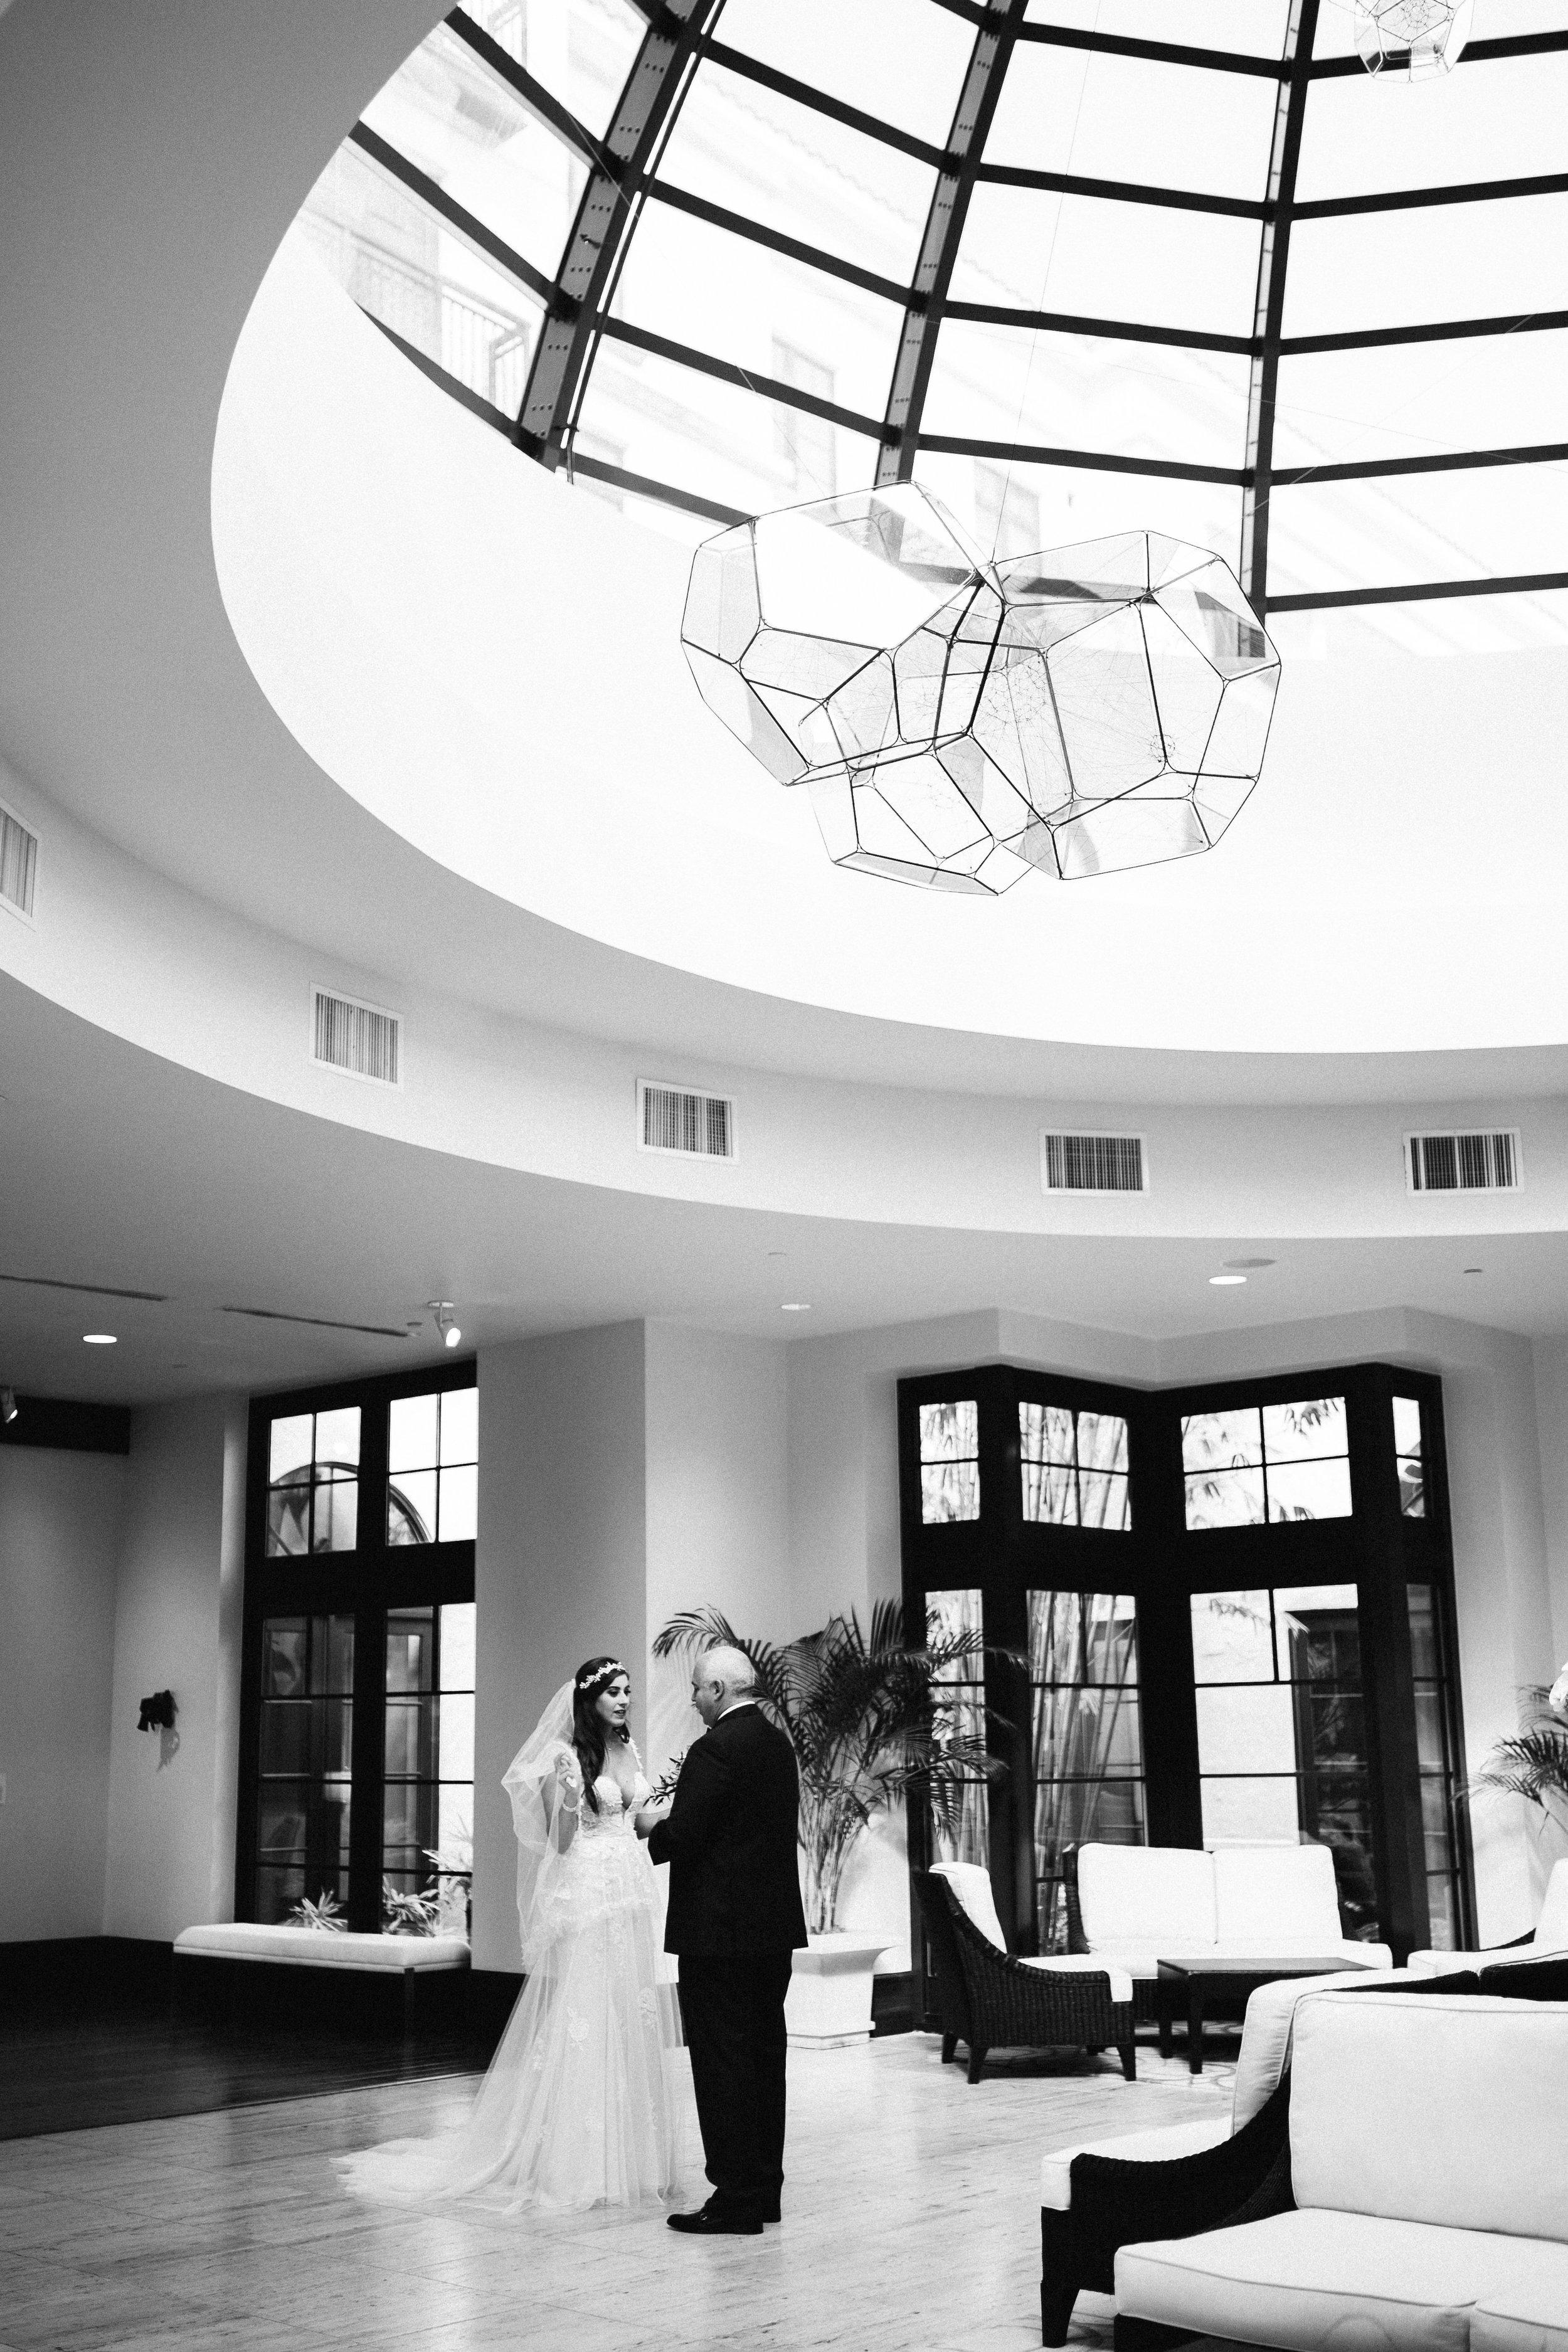 2017.10.15 Steffi and Elliott Simmonds Casa Feliz Wedding (187 of 969).jpg